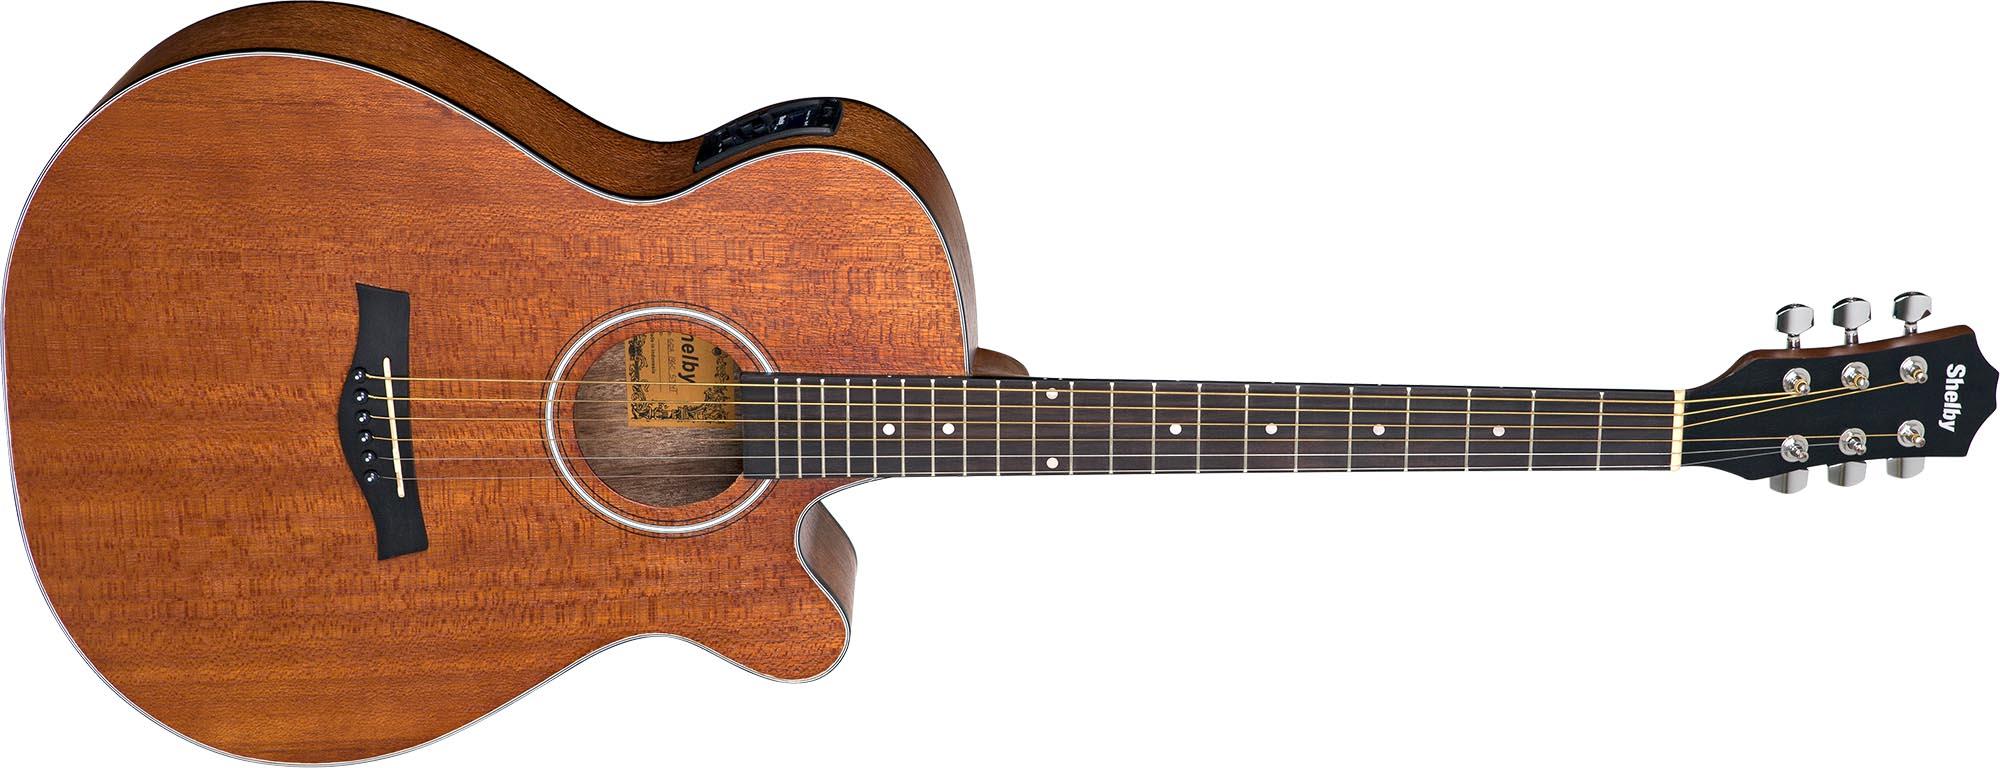 sga196c violao folk auditorium shelby sga196c stnt natural acetinado visao frontal